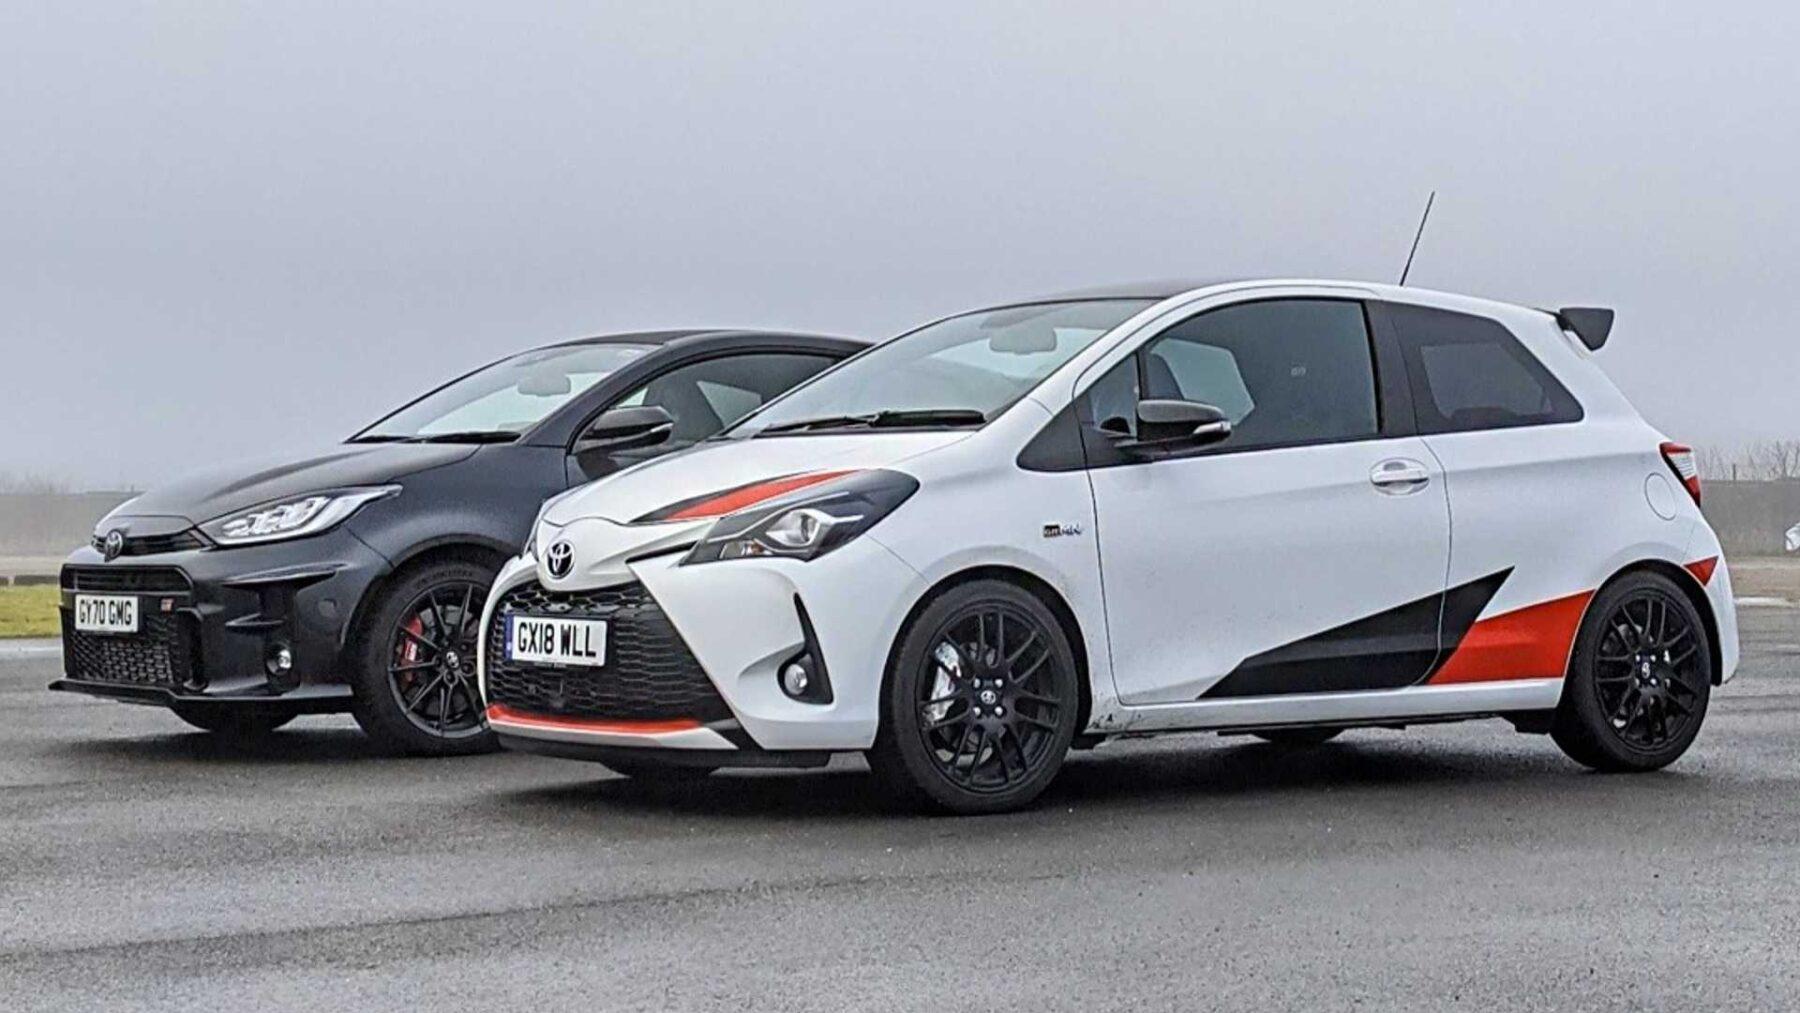 Toyota GR Yaris vs. Yaris GRMN